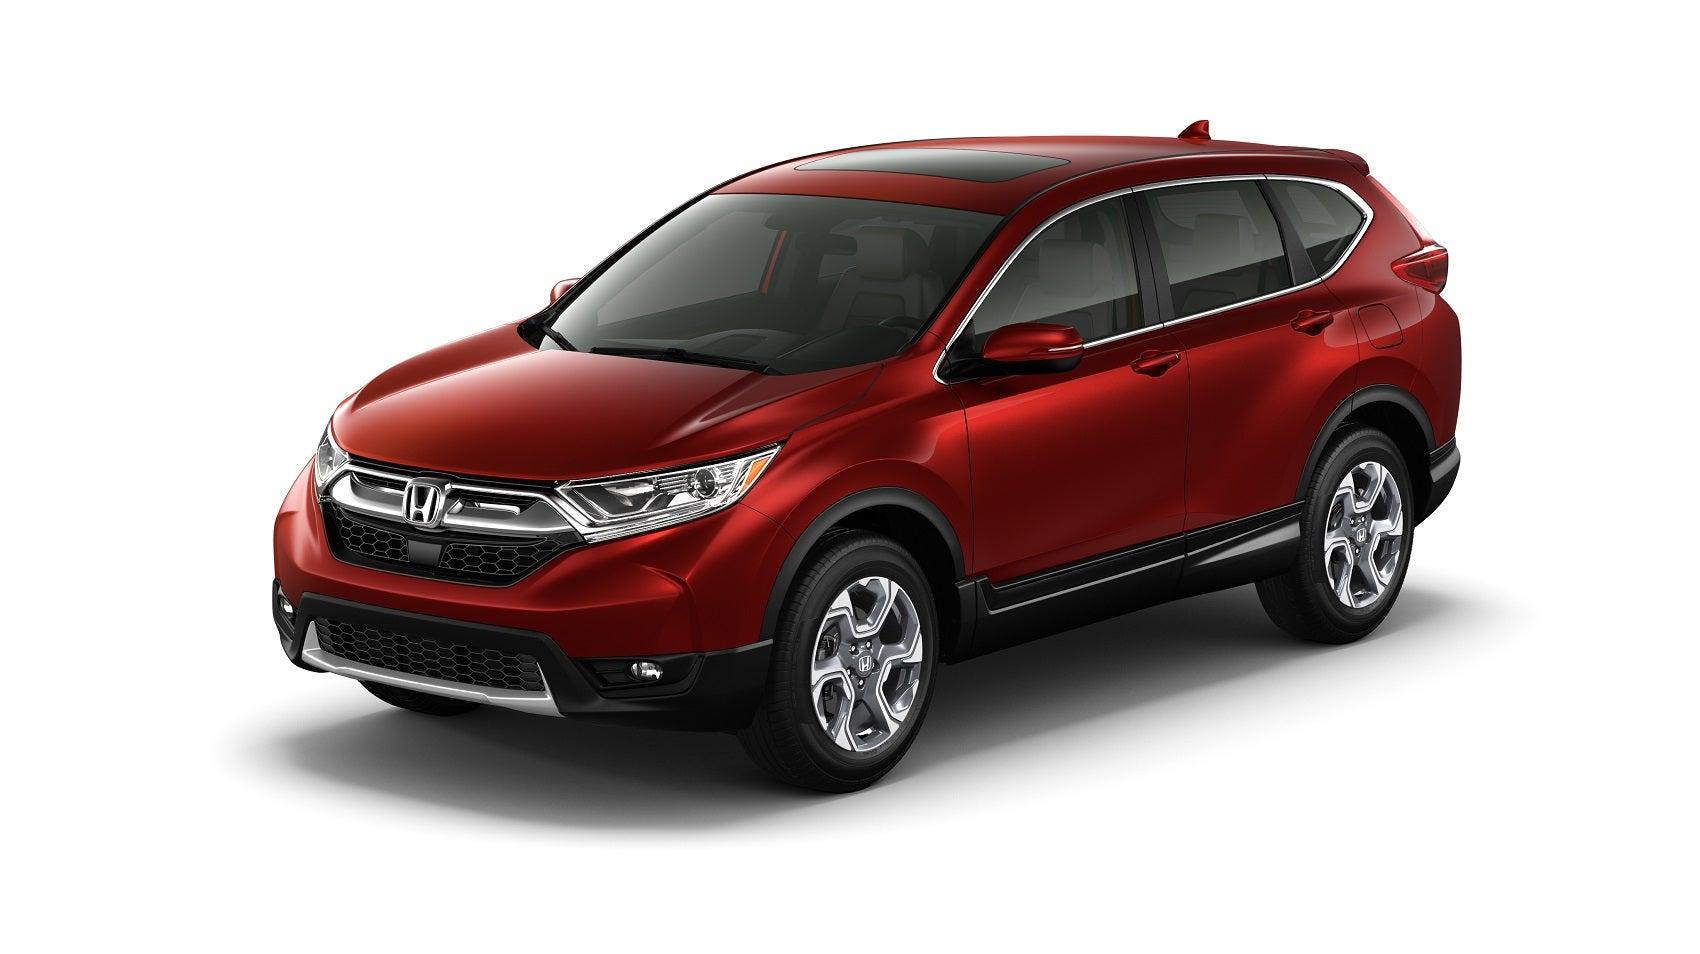 Certified Pre-Owned Honda Mechanicsburg PA